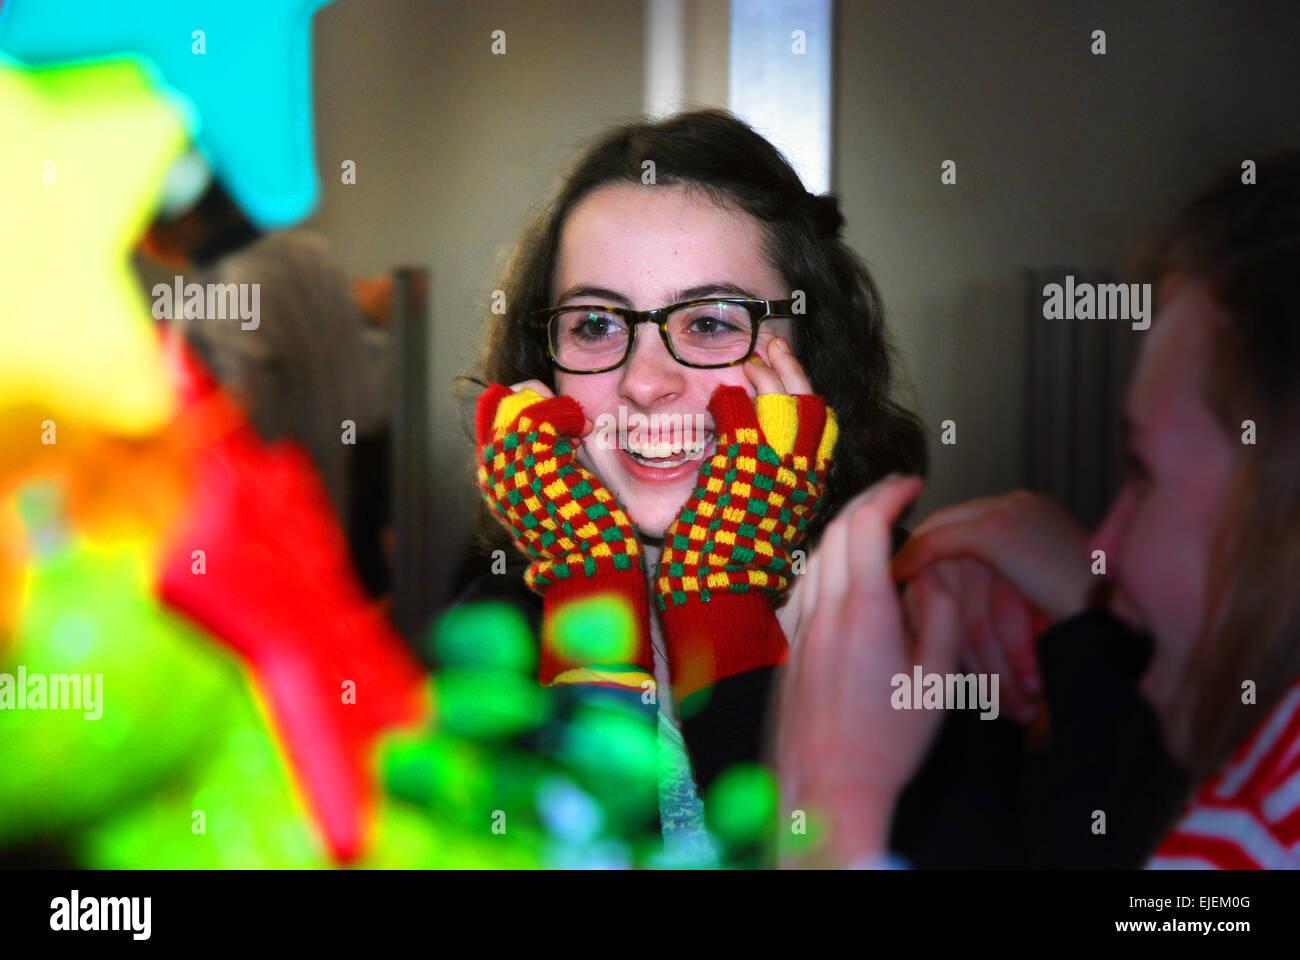 Schoolgirl having fun at carnival, Netherlands - Stock Image